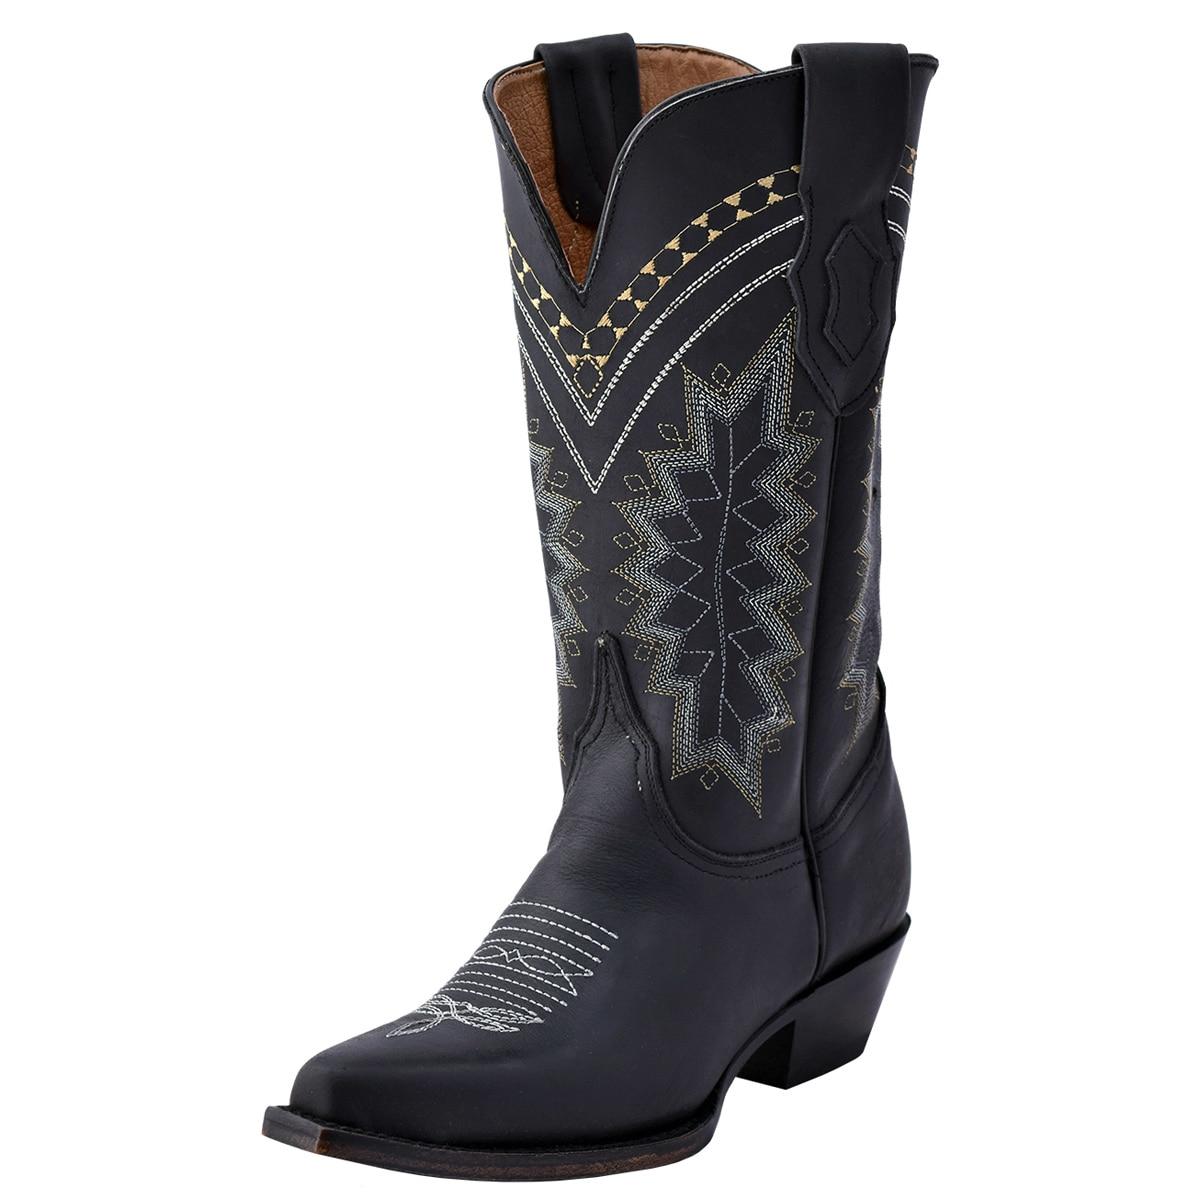 Ferrini Women's Navajo Snip Toe Boots